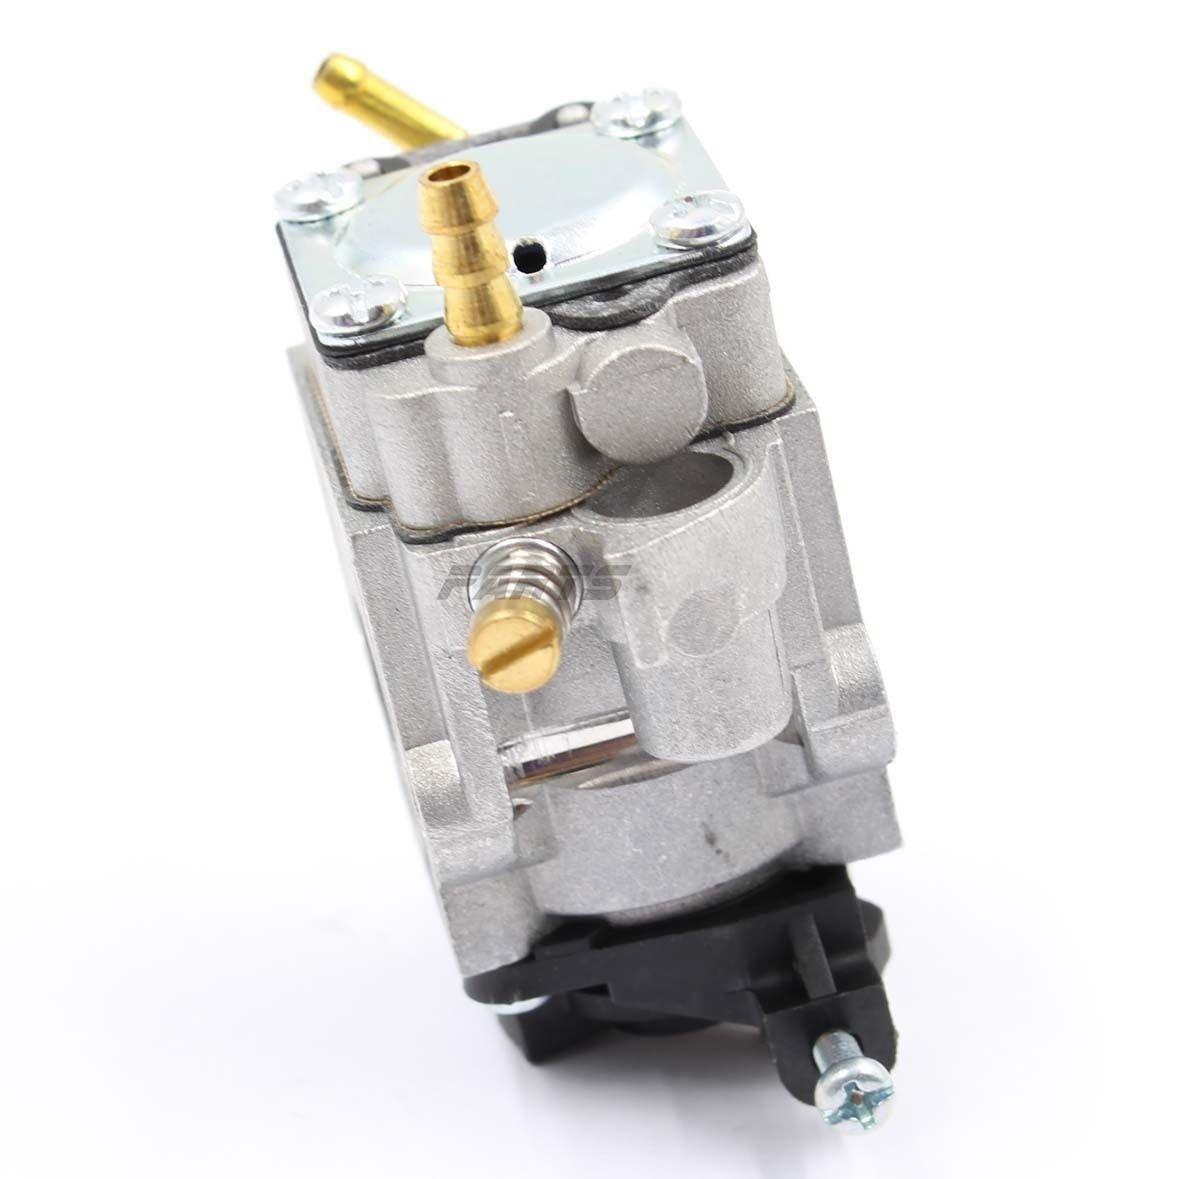 Qiankun Remplace Walbro Carburateur Carb Wyk-406//Wyk-345/Echo Pb-770/Pb-770h Pb-770t Blowers